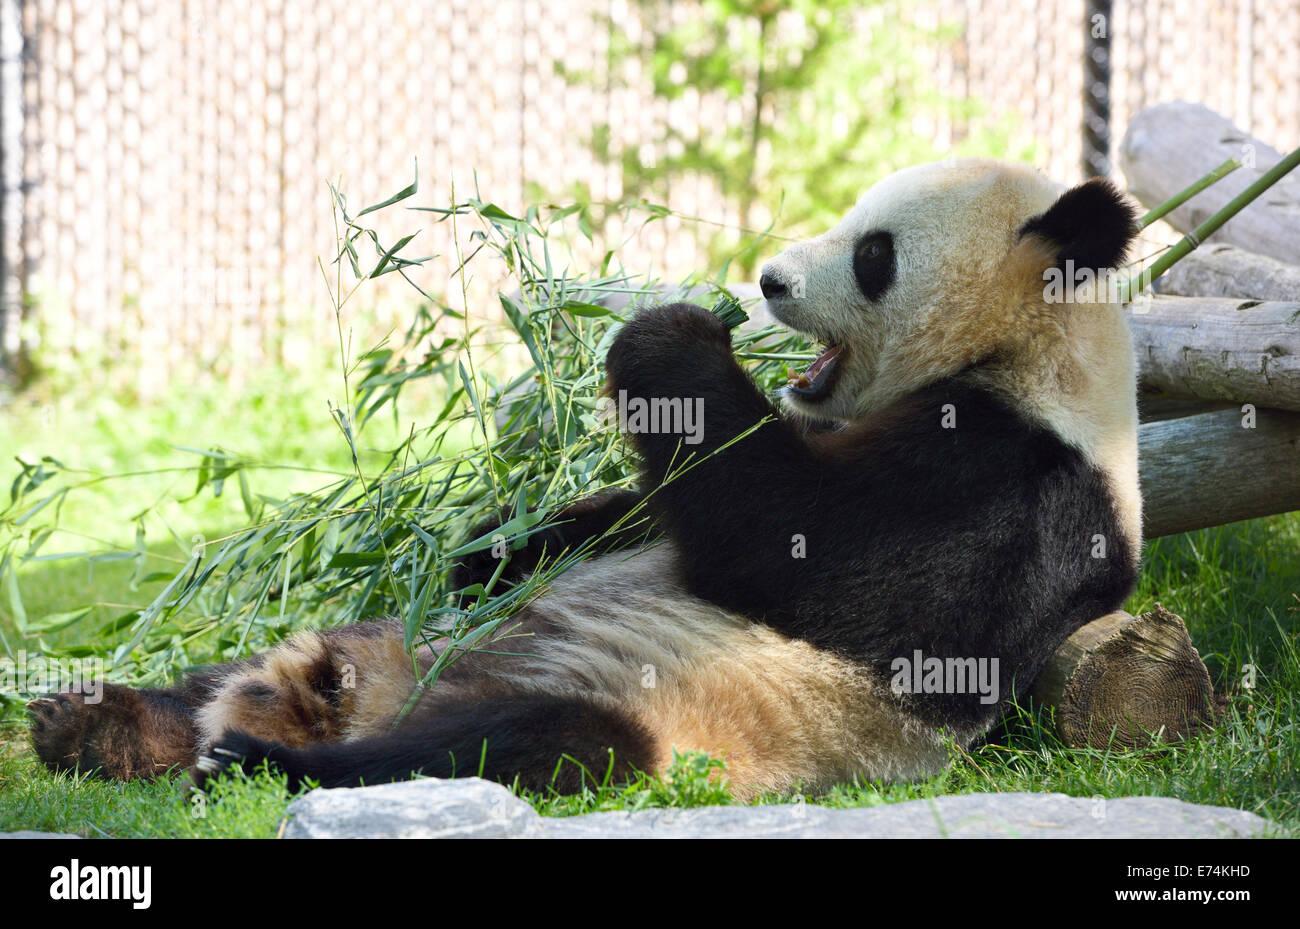 Er meidet Giant Panda Essen Bambus im Zoo von Toronto Stockbild